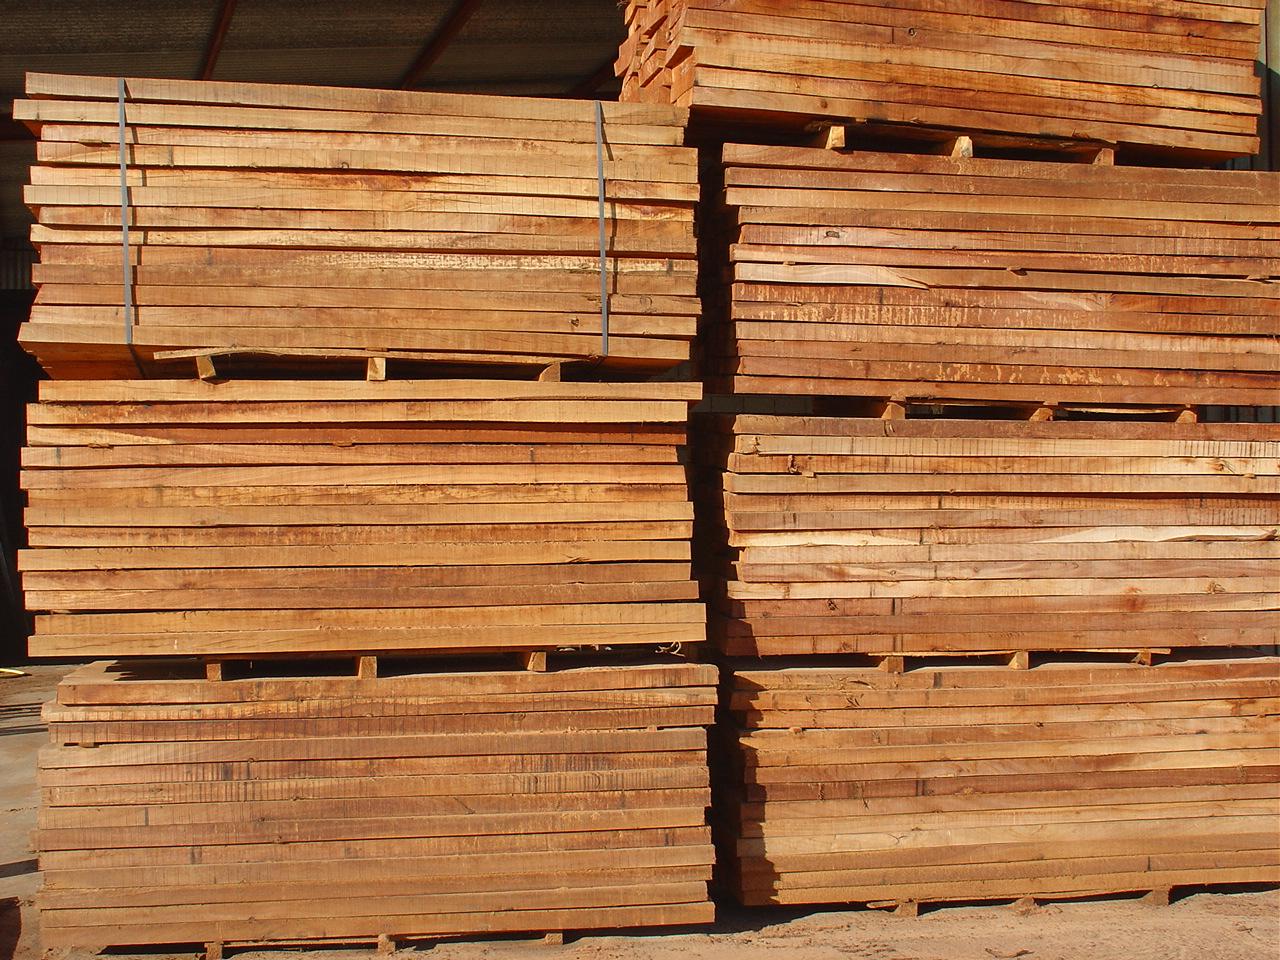 Tabl n aserrexsa - Tablones de madera baratos ...